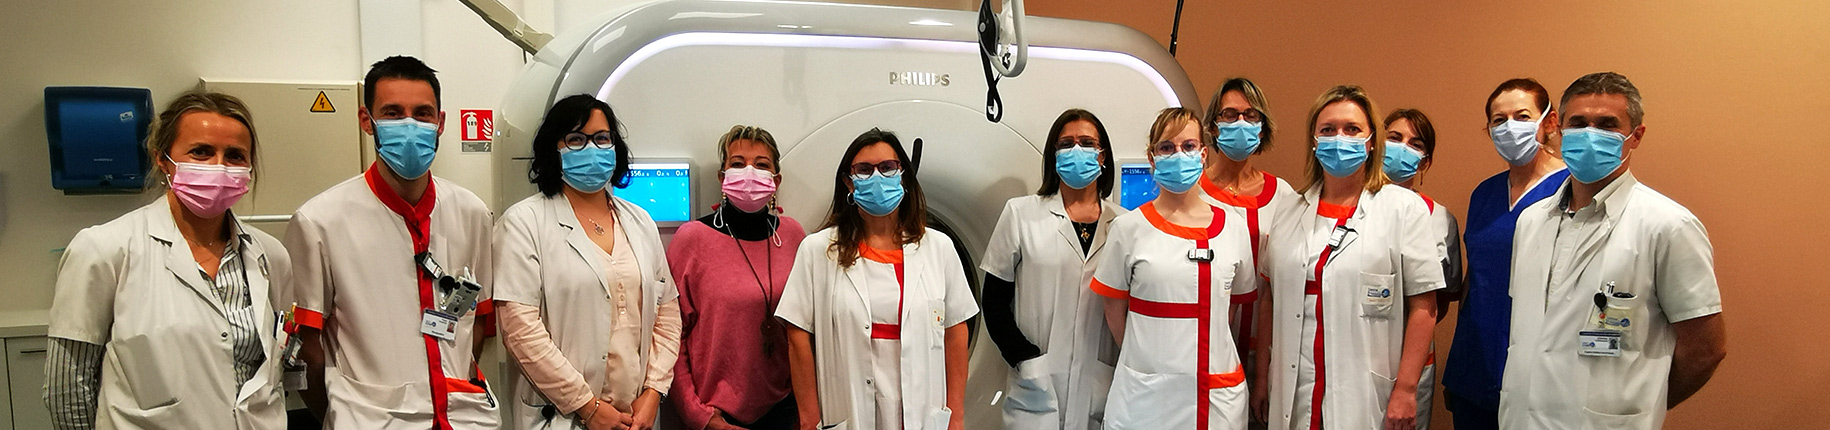 Radiologie – Sénologie